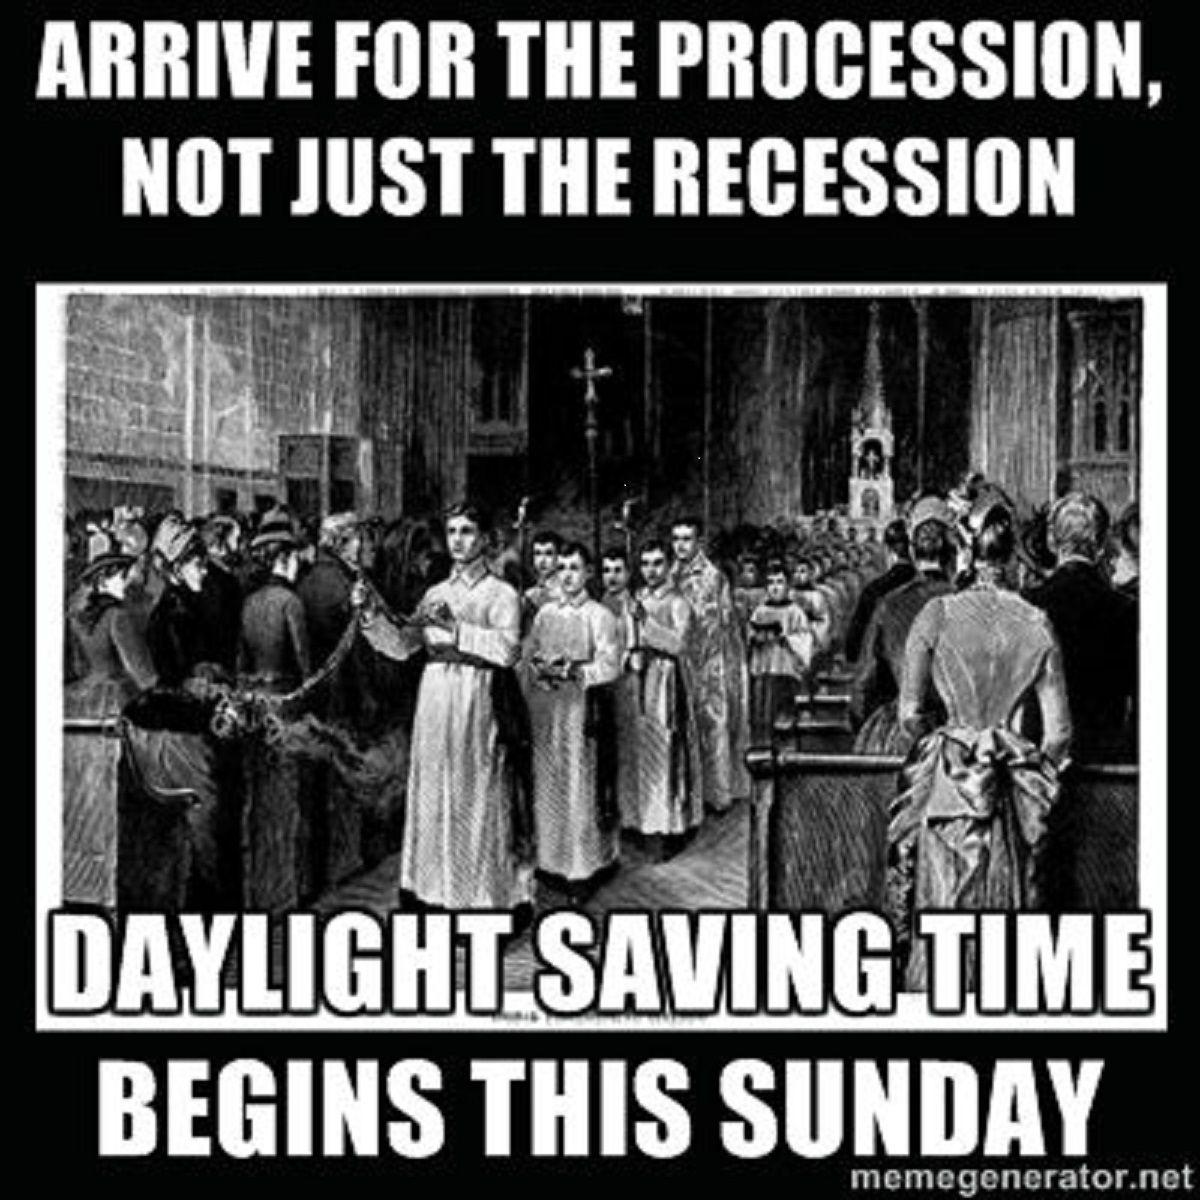 Daylight Saving Time Begins This Sunday Daylight Savings Daylight Savings Meme Daylight Savings Time